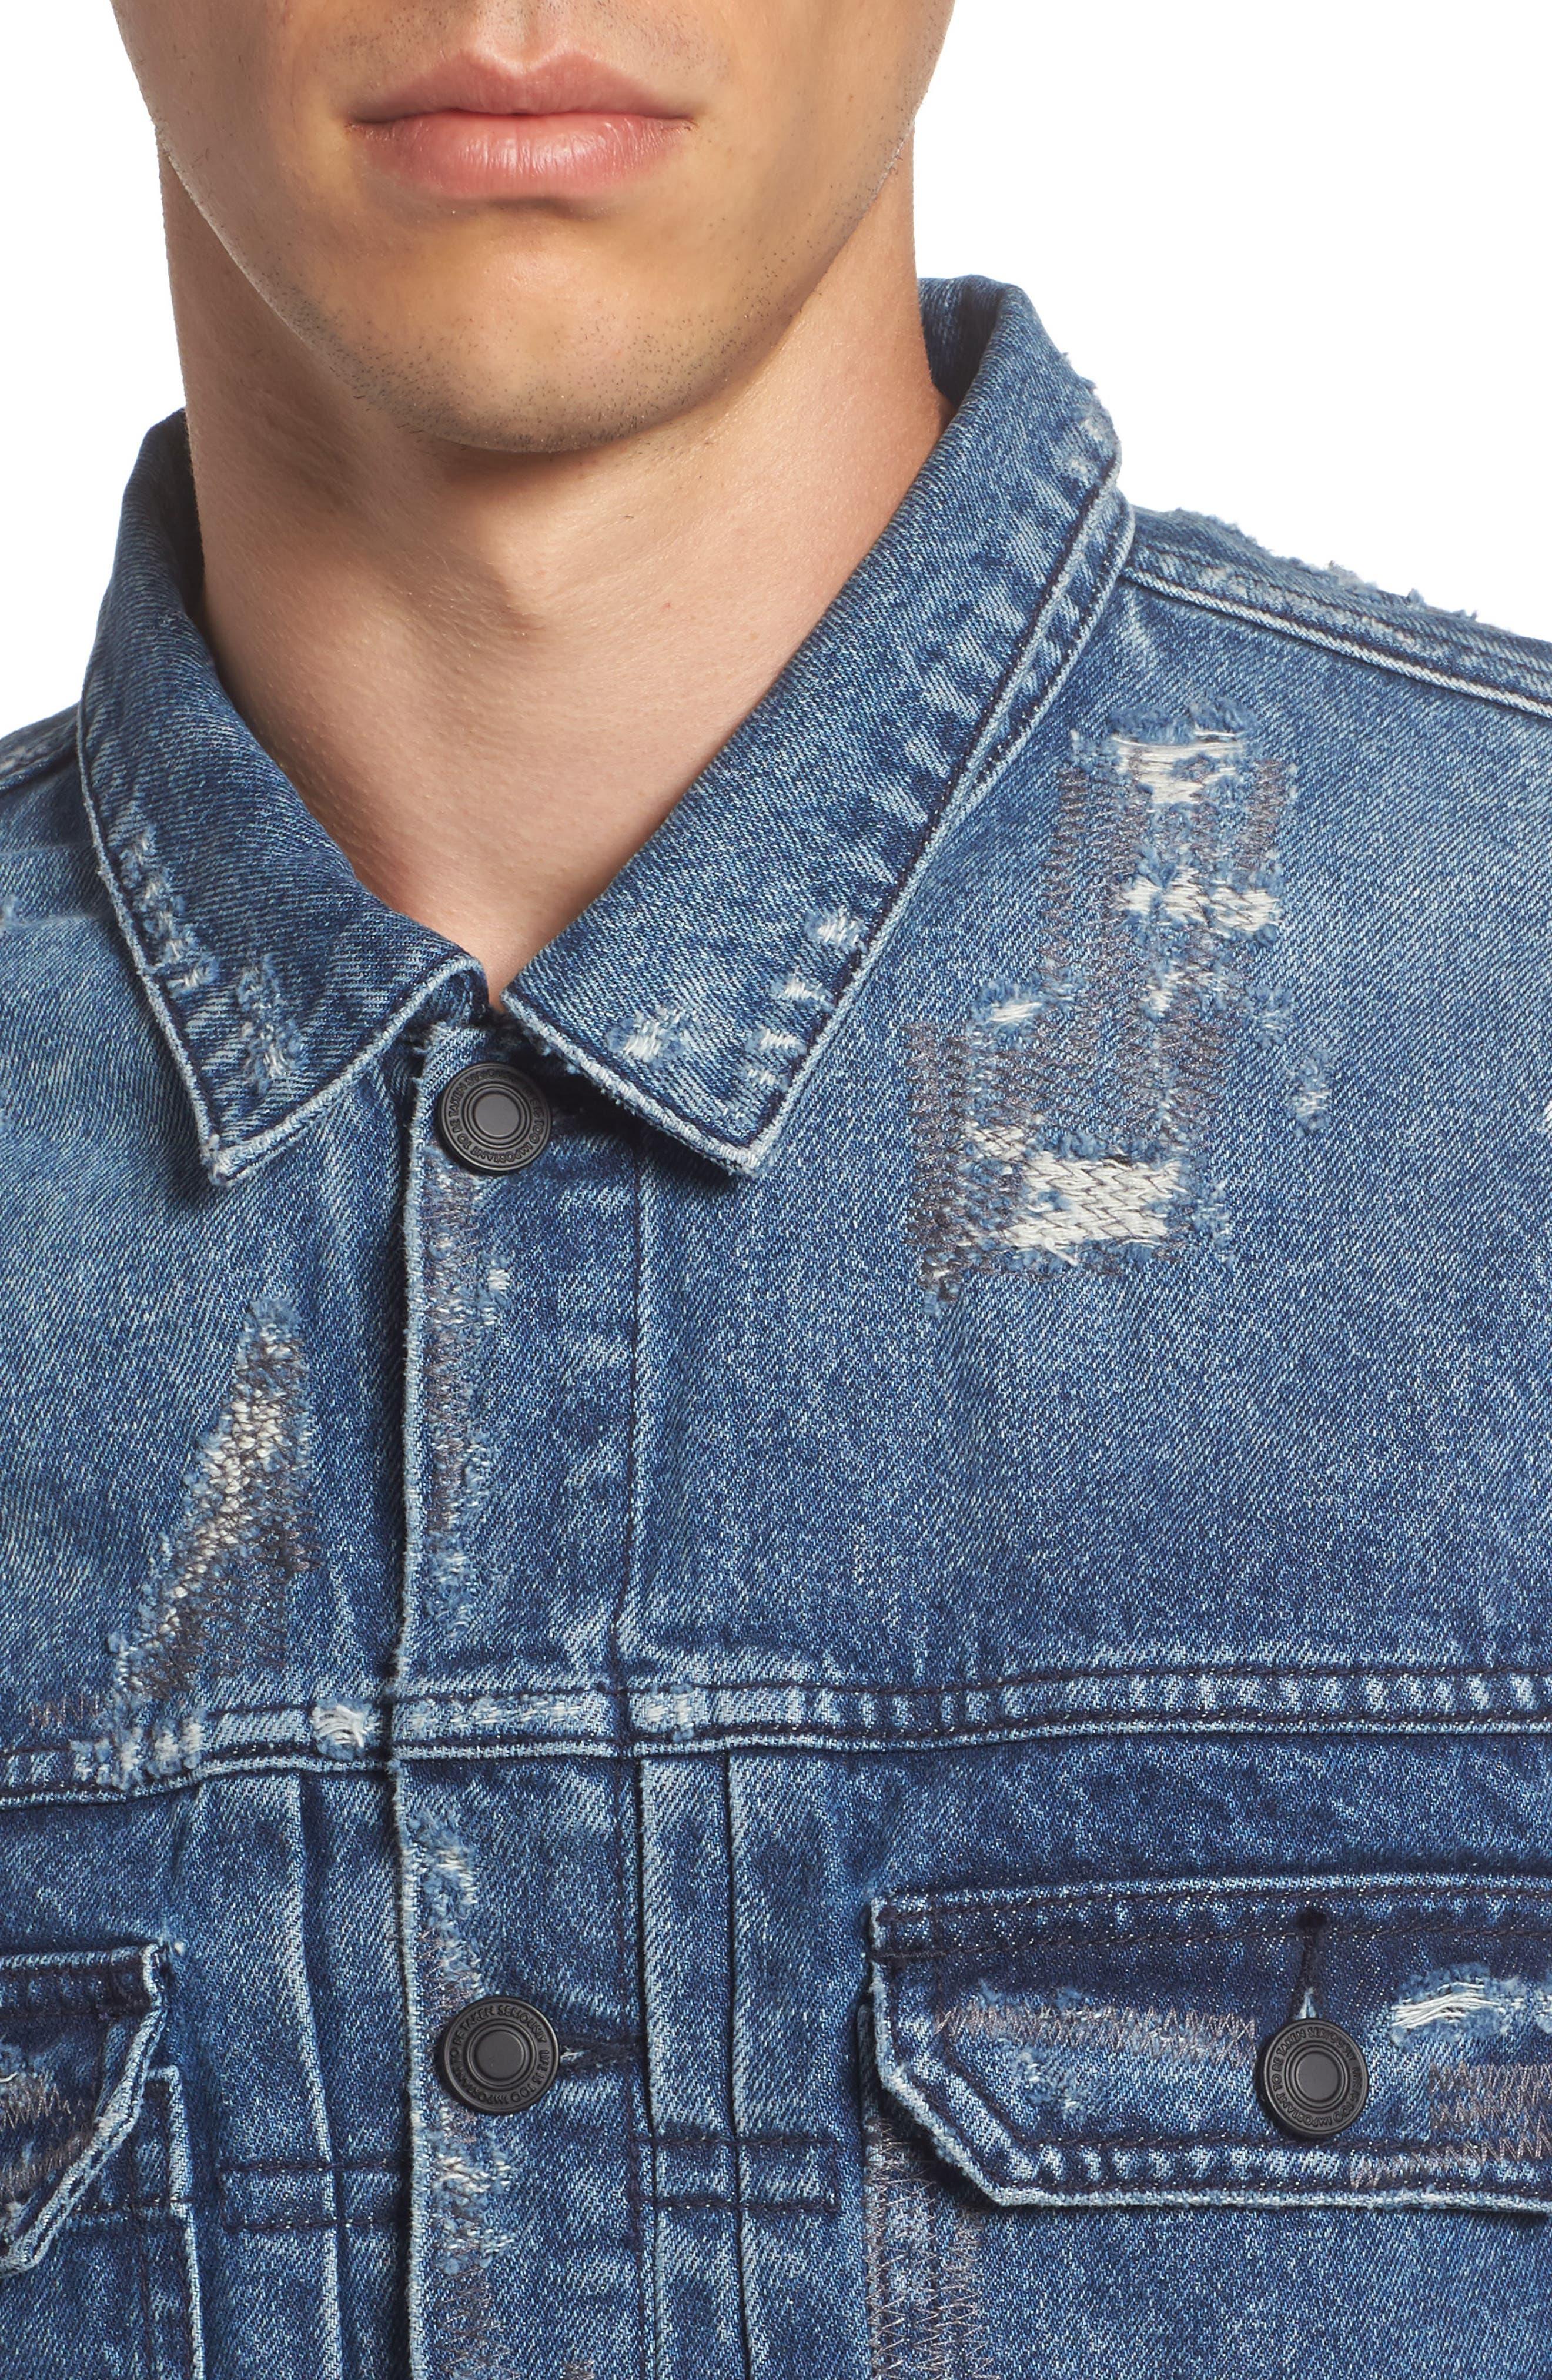 Trash Denim Jacket,                             Alternate thumbnail 4, color,                             Metal